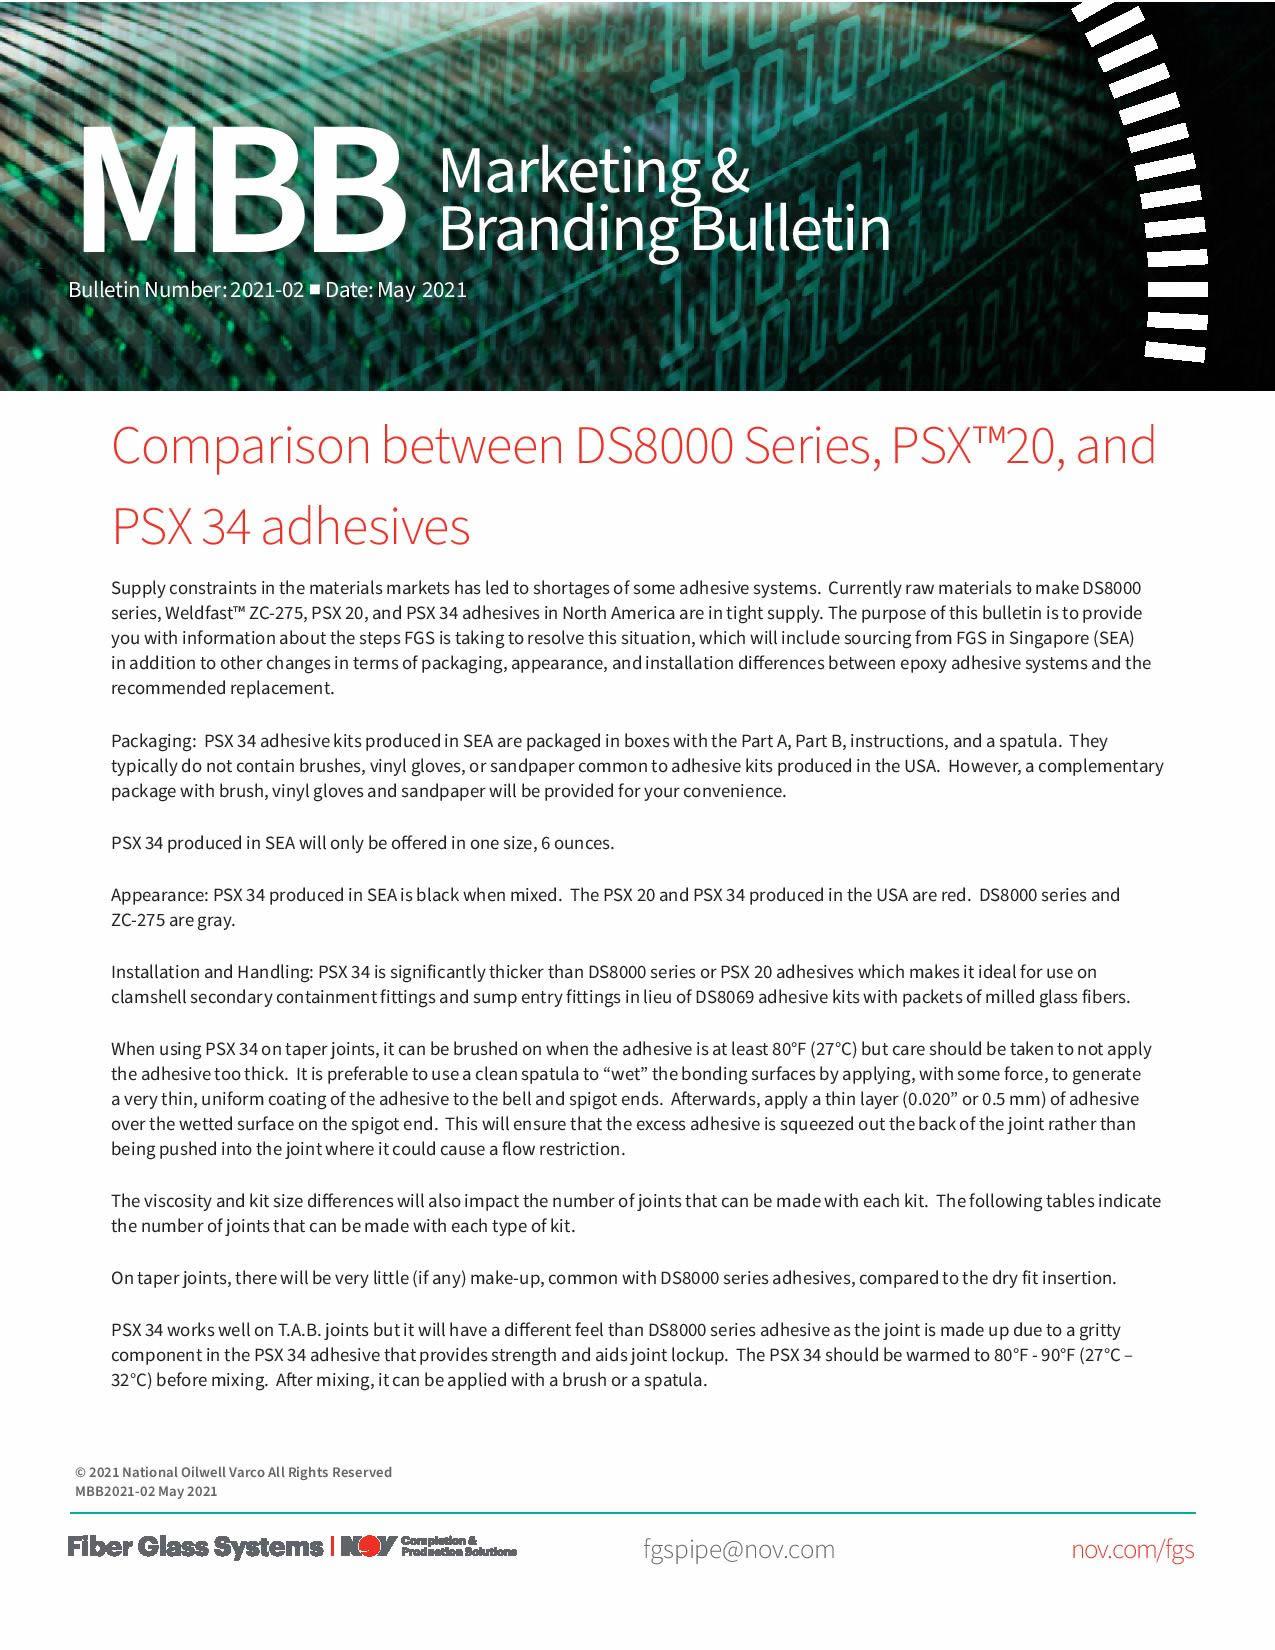 NOV Marketing & Branding Bulletin Page 1